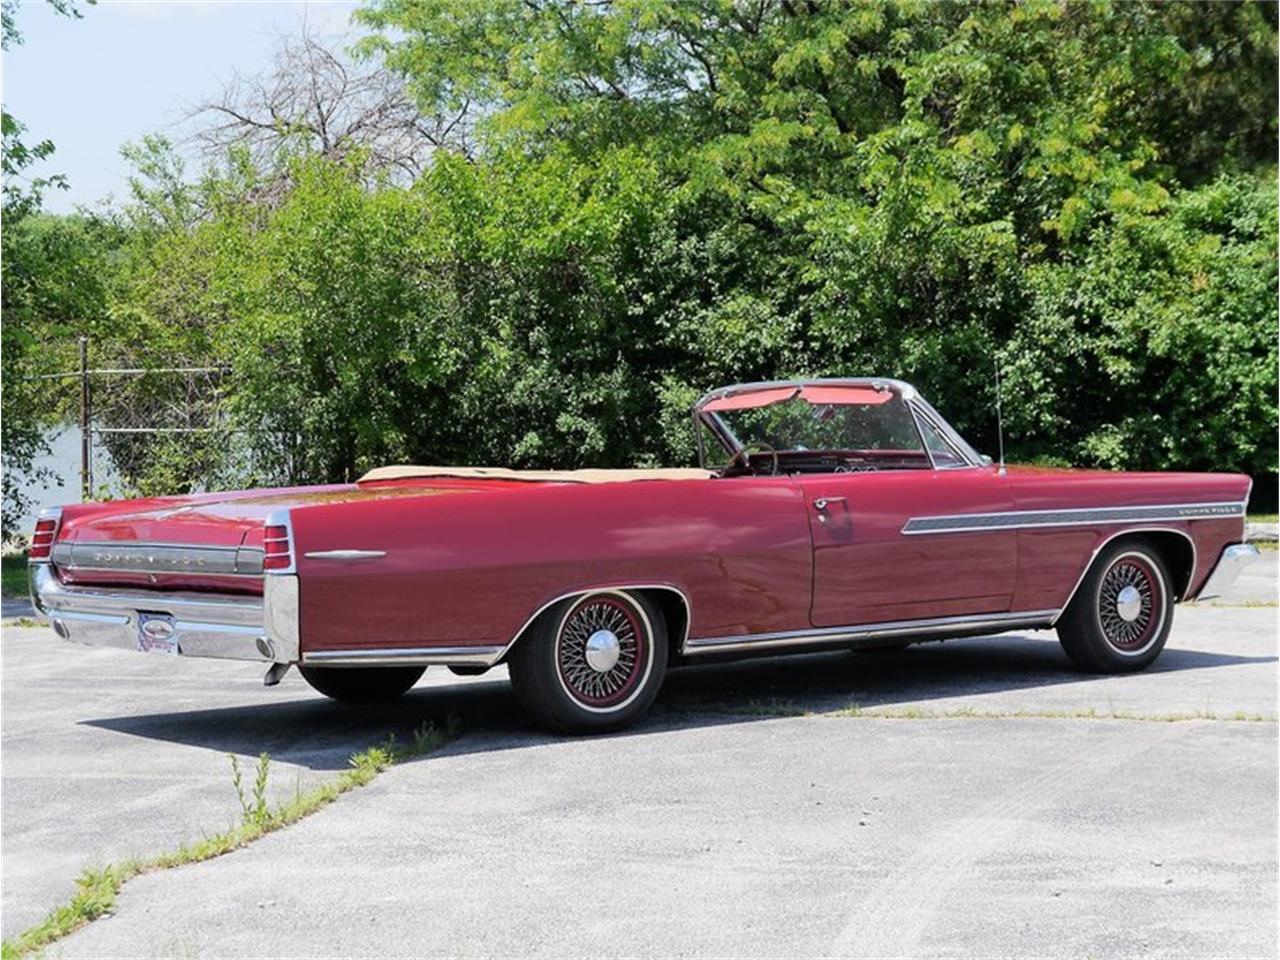 Large Picture of Classic '63 Pontiac Bonneville located in Alsip Illinois - $29,900.00 - LAZG